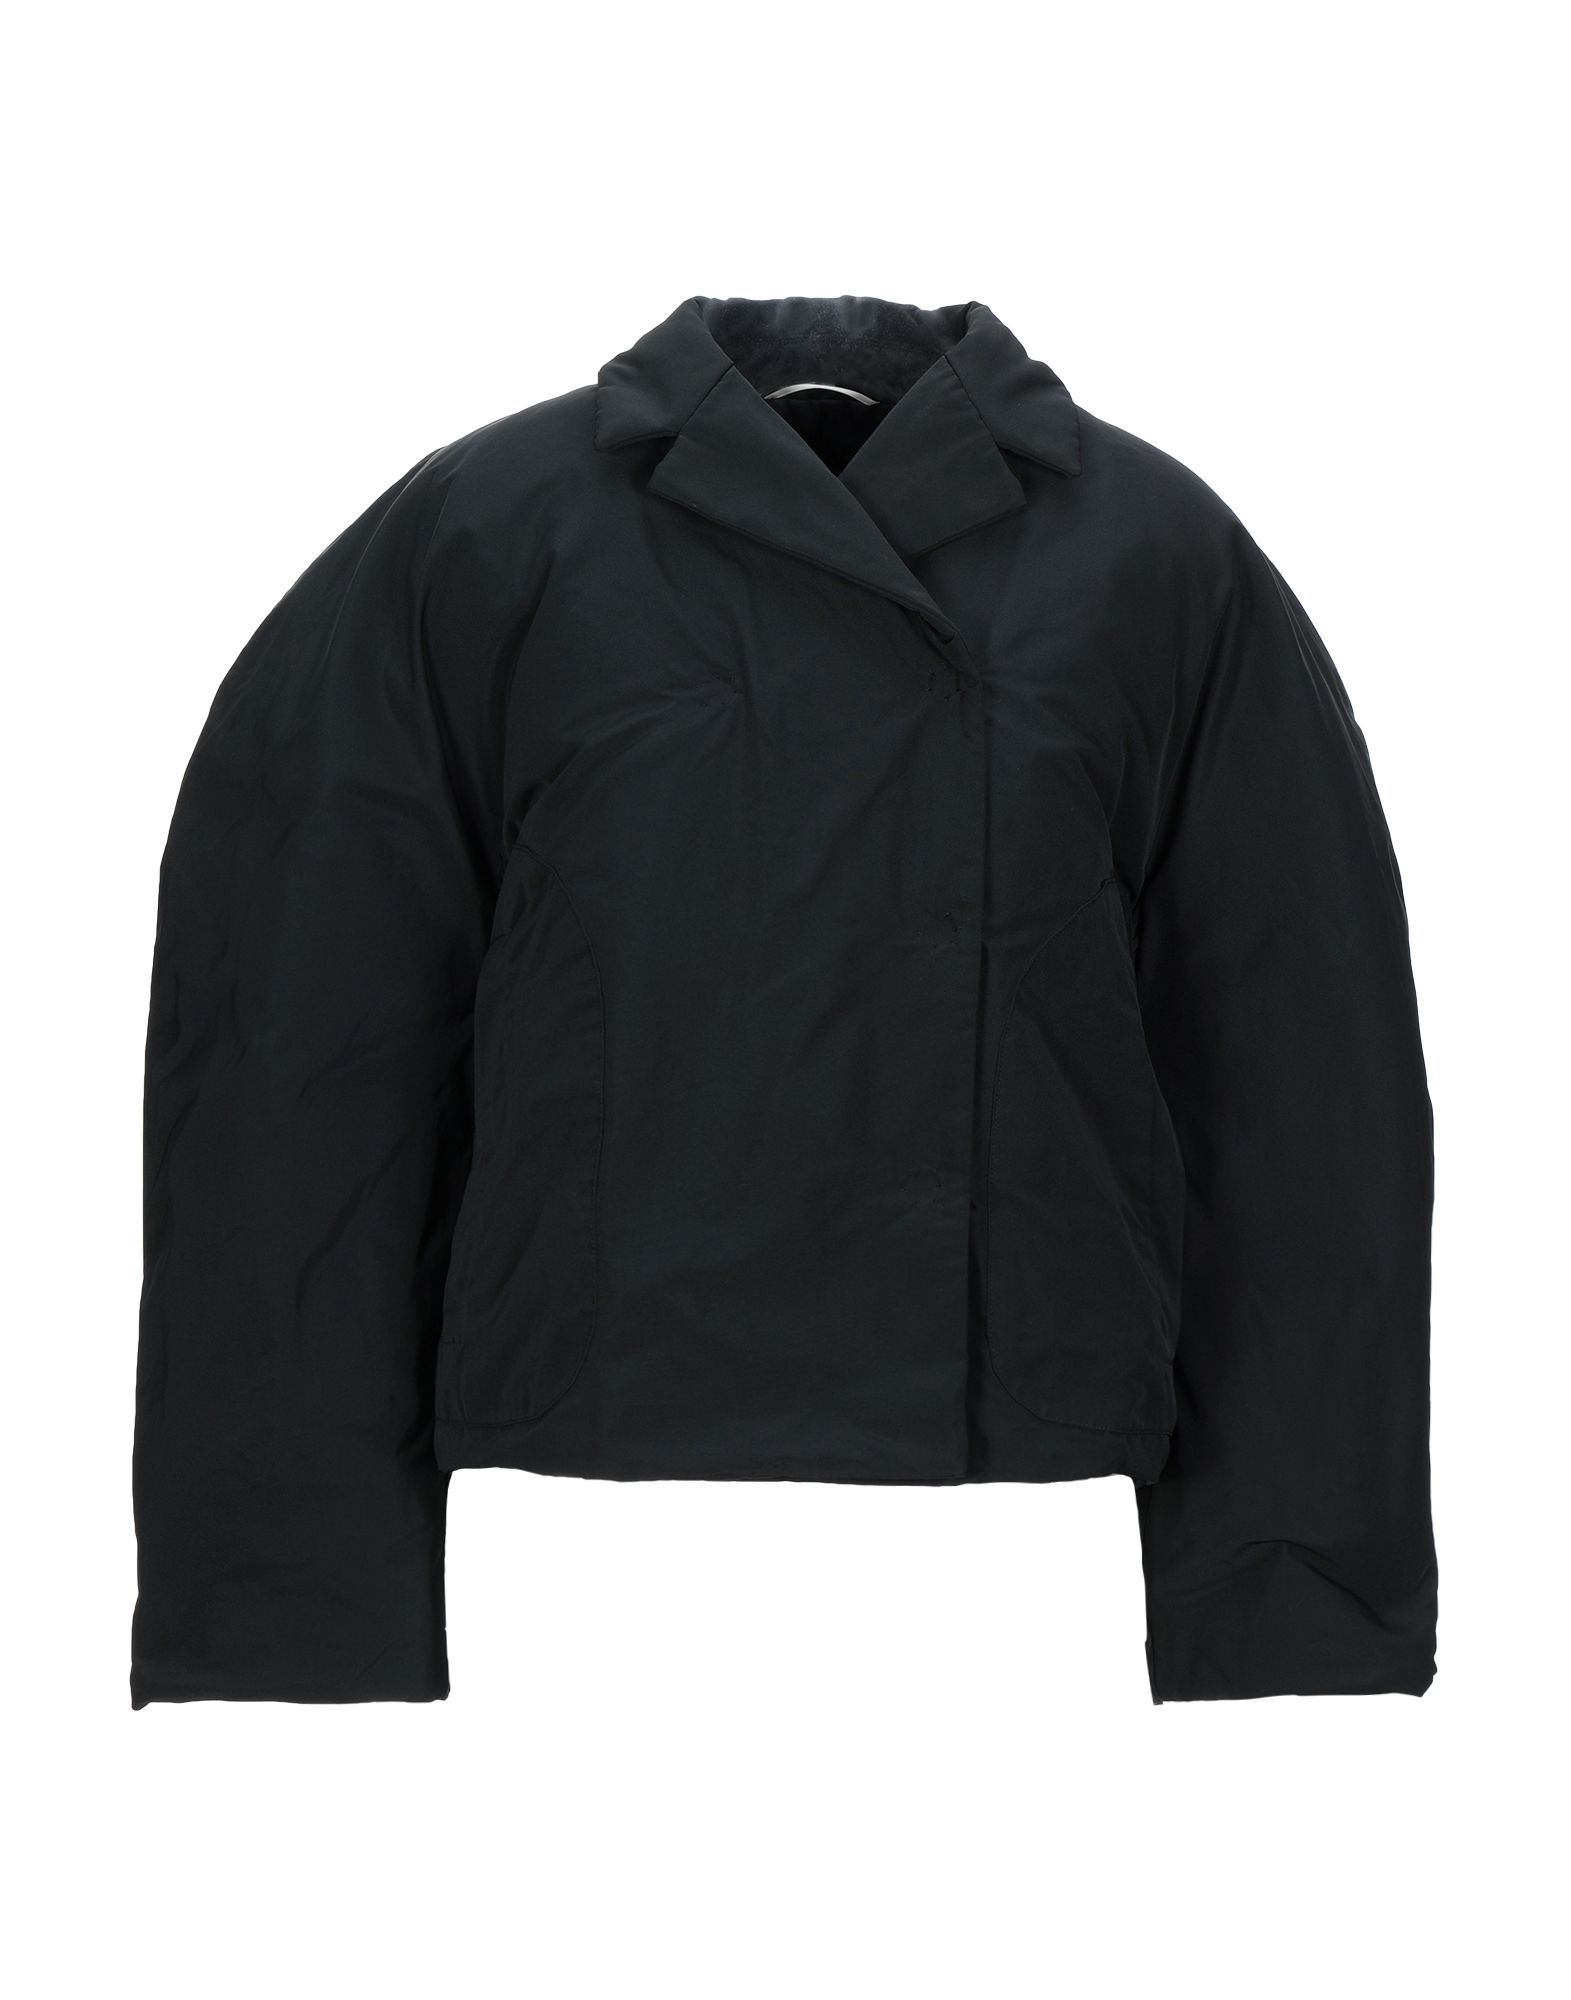 YOOX.COM(ユークス)《セール開催中》ROCHAS レディース 合成繊維中綿アウター ブラック 40 ポリエステル 100%